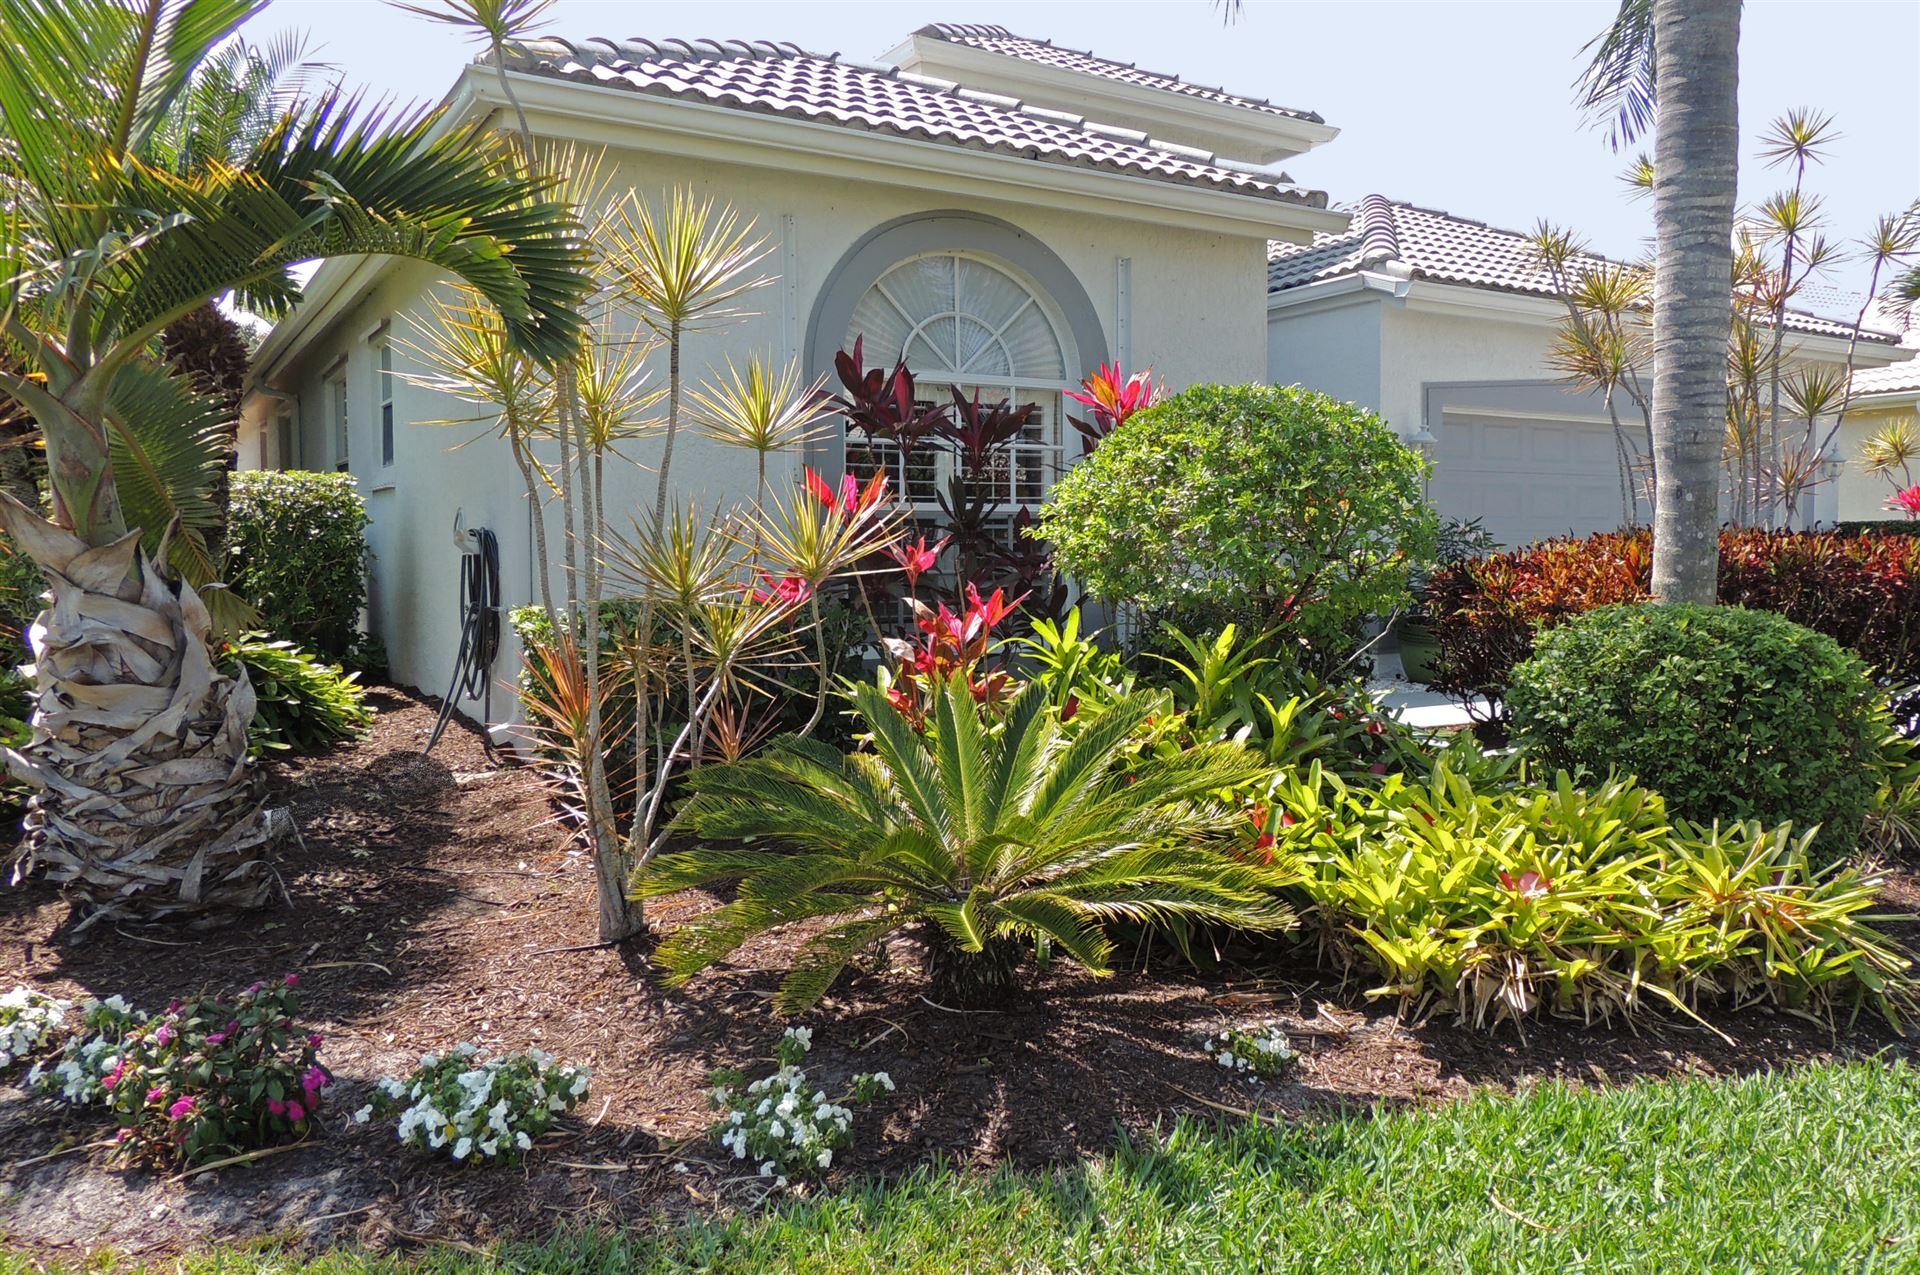 Photo of 1655 Ballantrae Boulevard N, Port Saint Lucie, FL 34952 (MLS # RX-10612780)